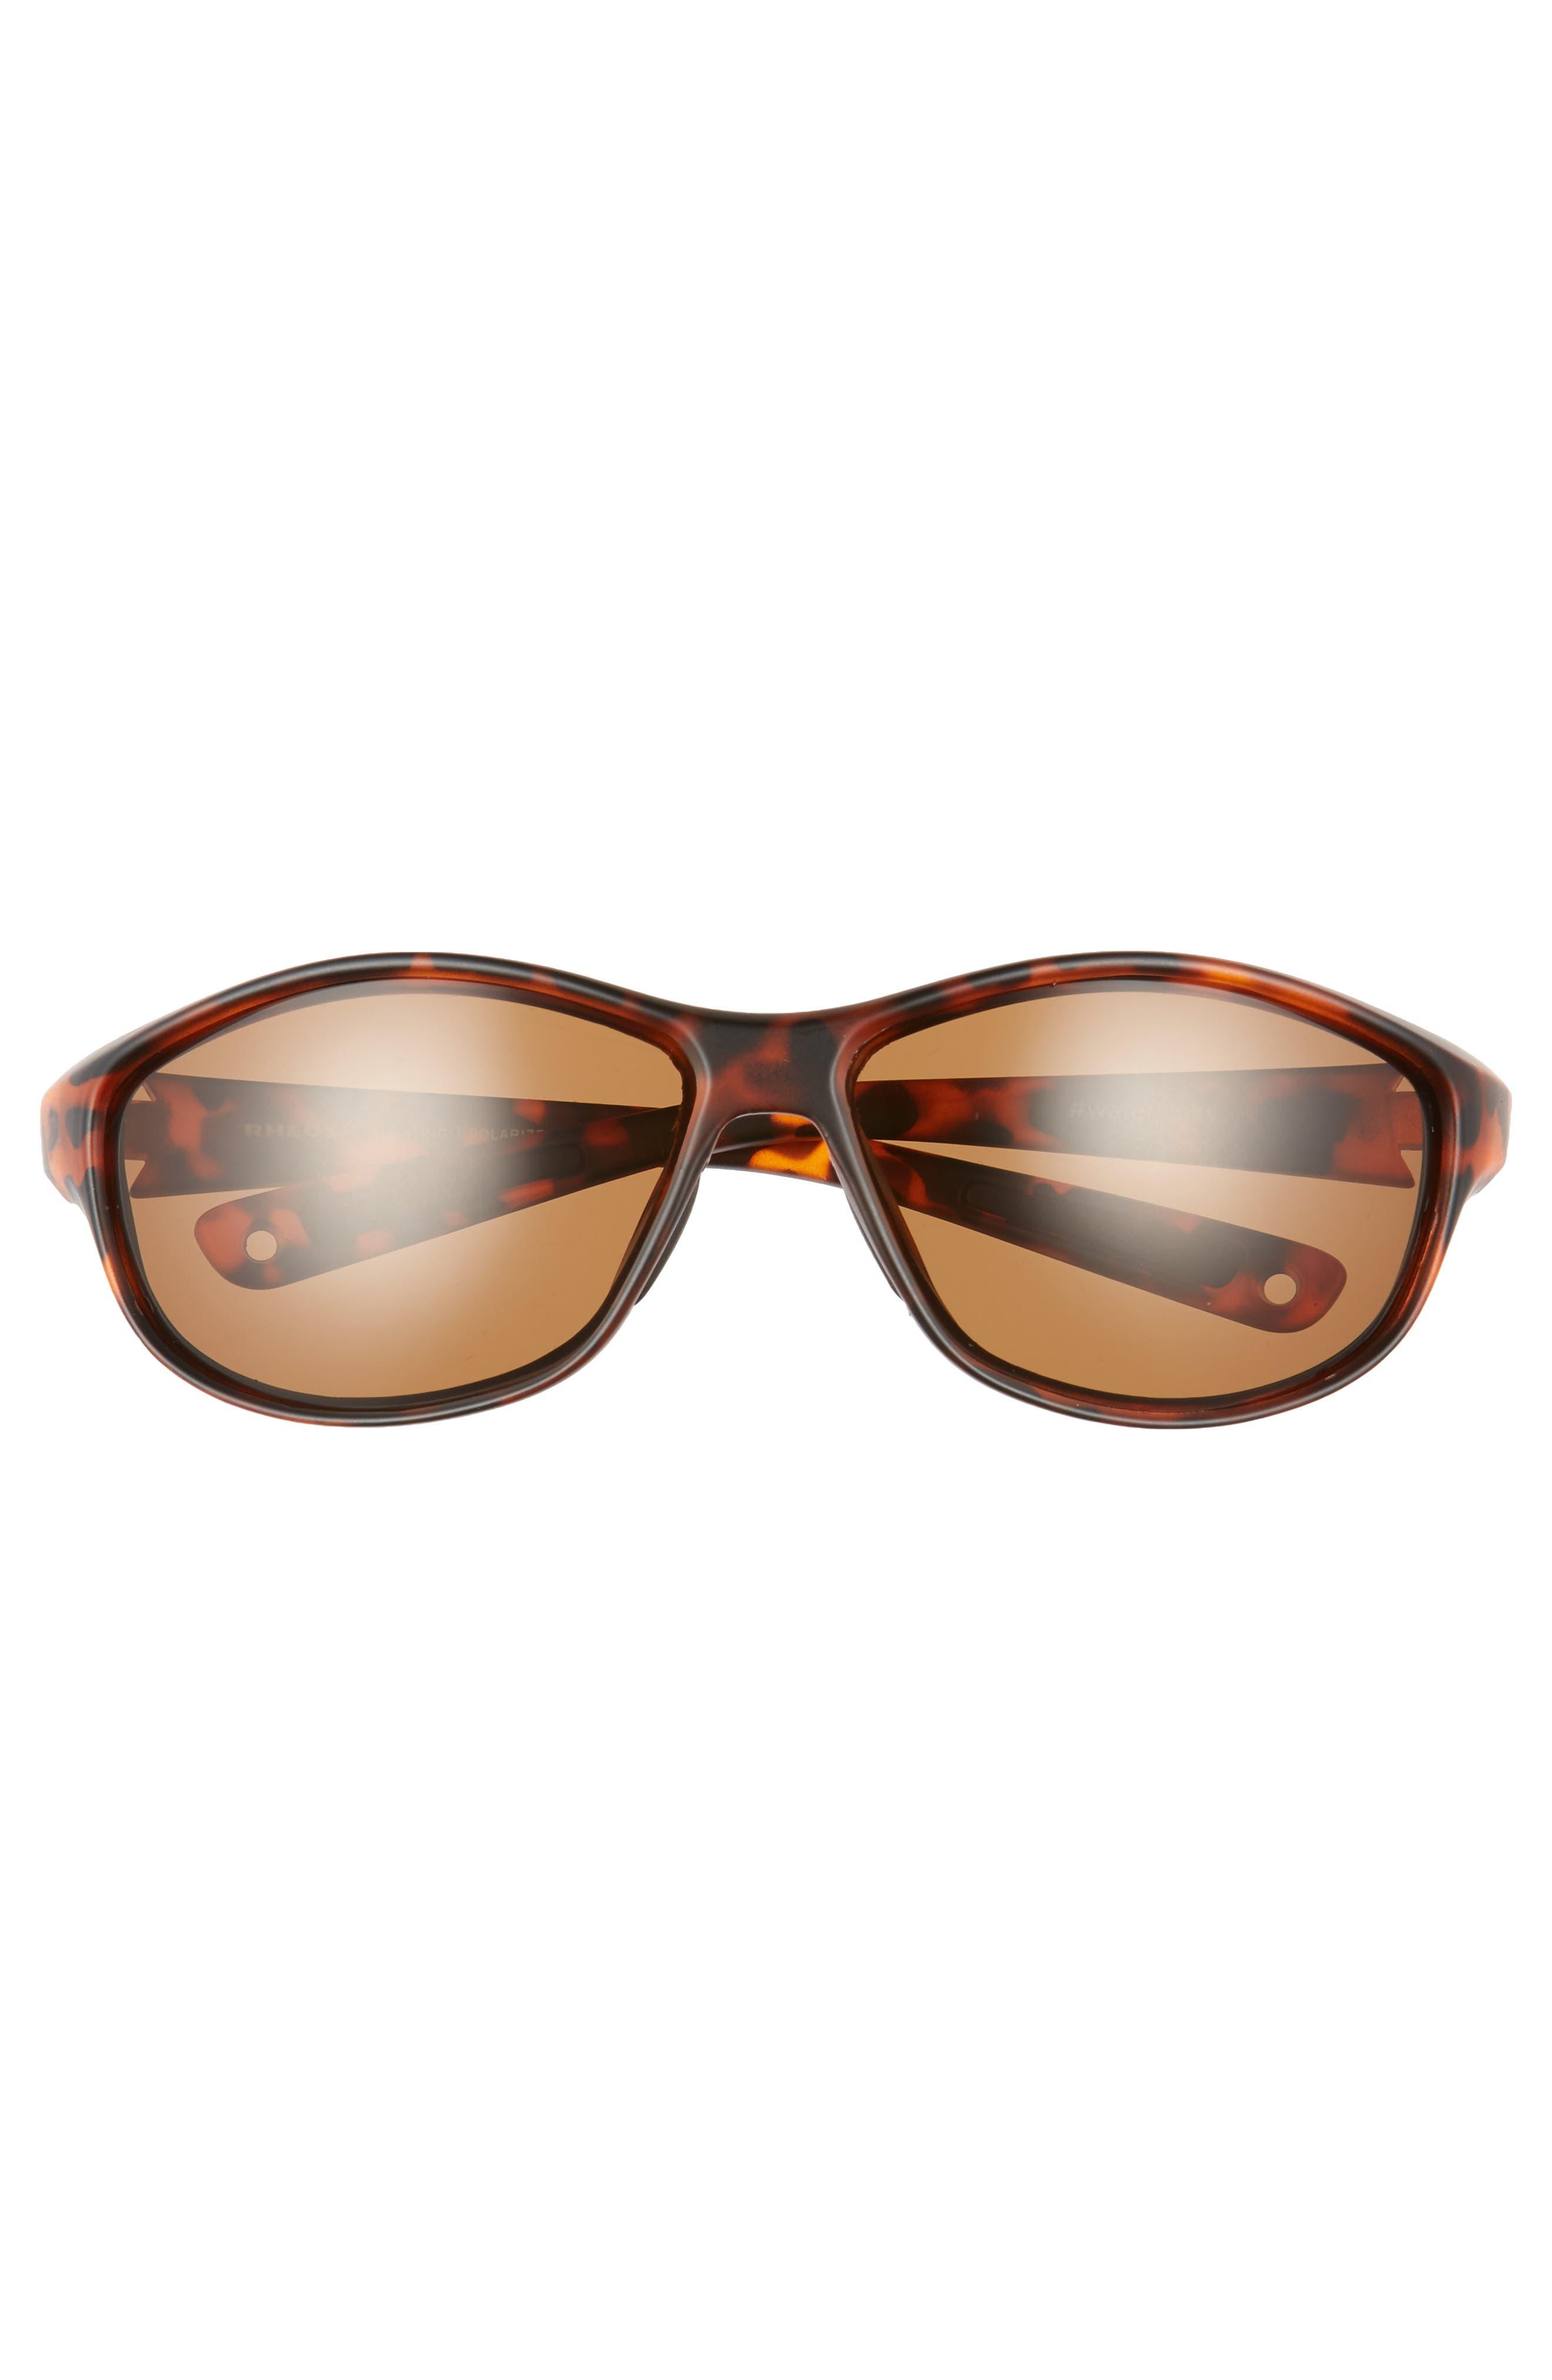 Bahias Floating 60mm Polarized Sunglasses,                             Alternate thumbnail 2, color,                             Tortoise / Amber